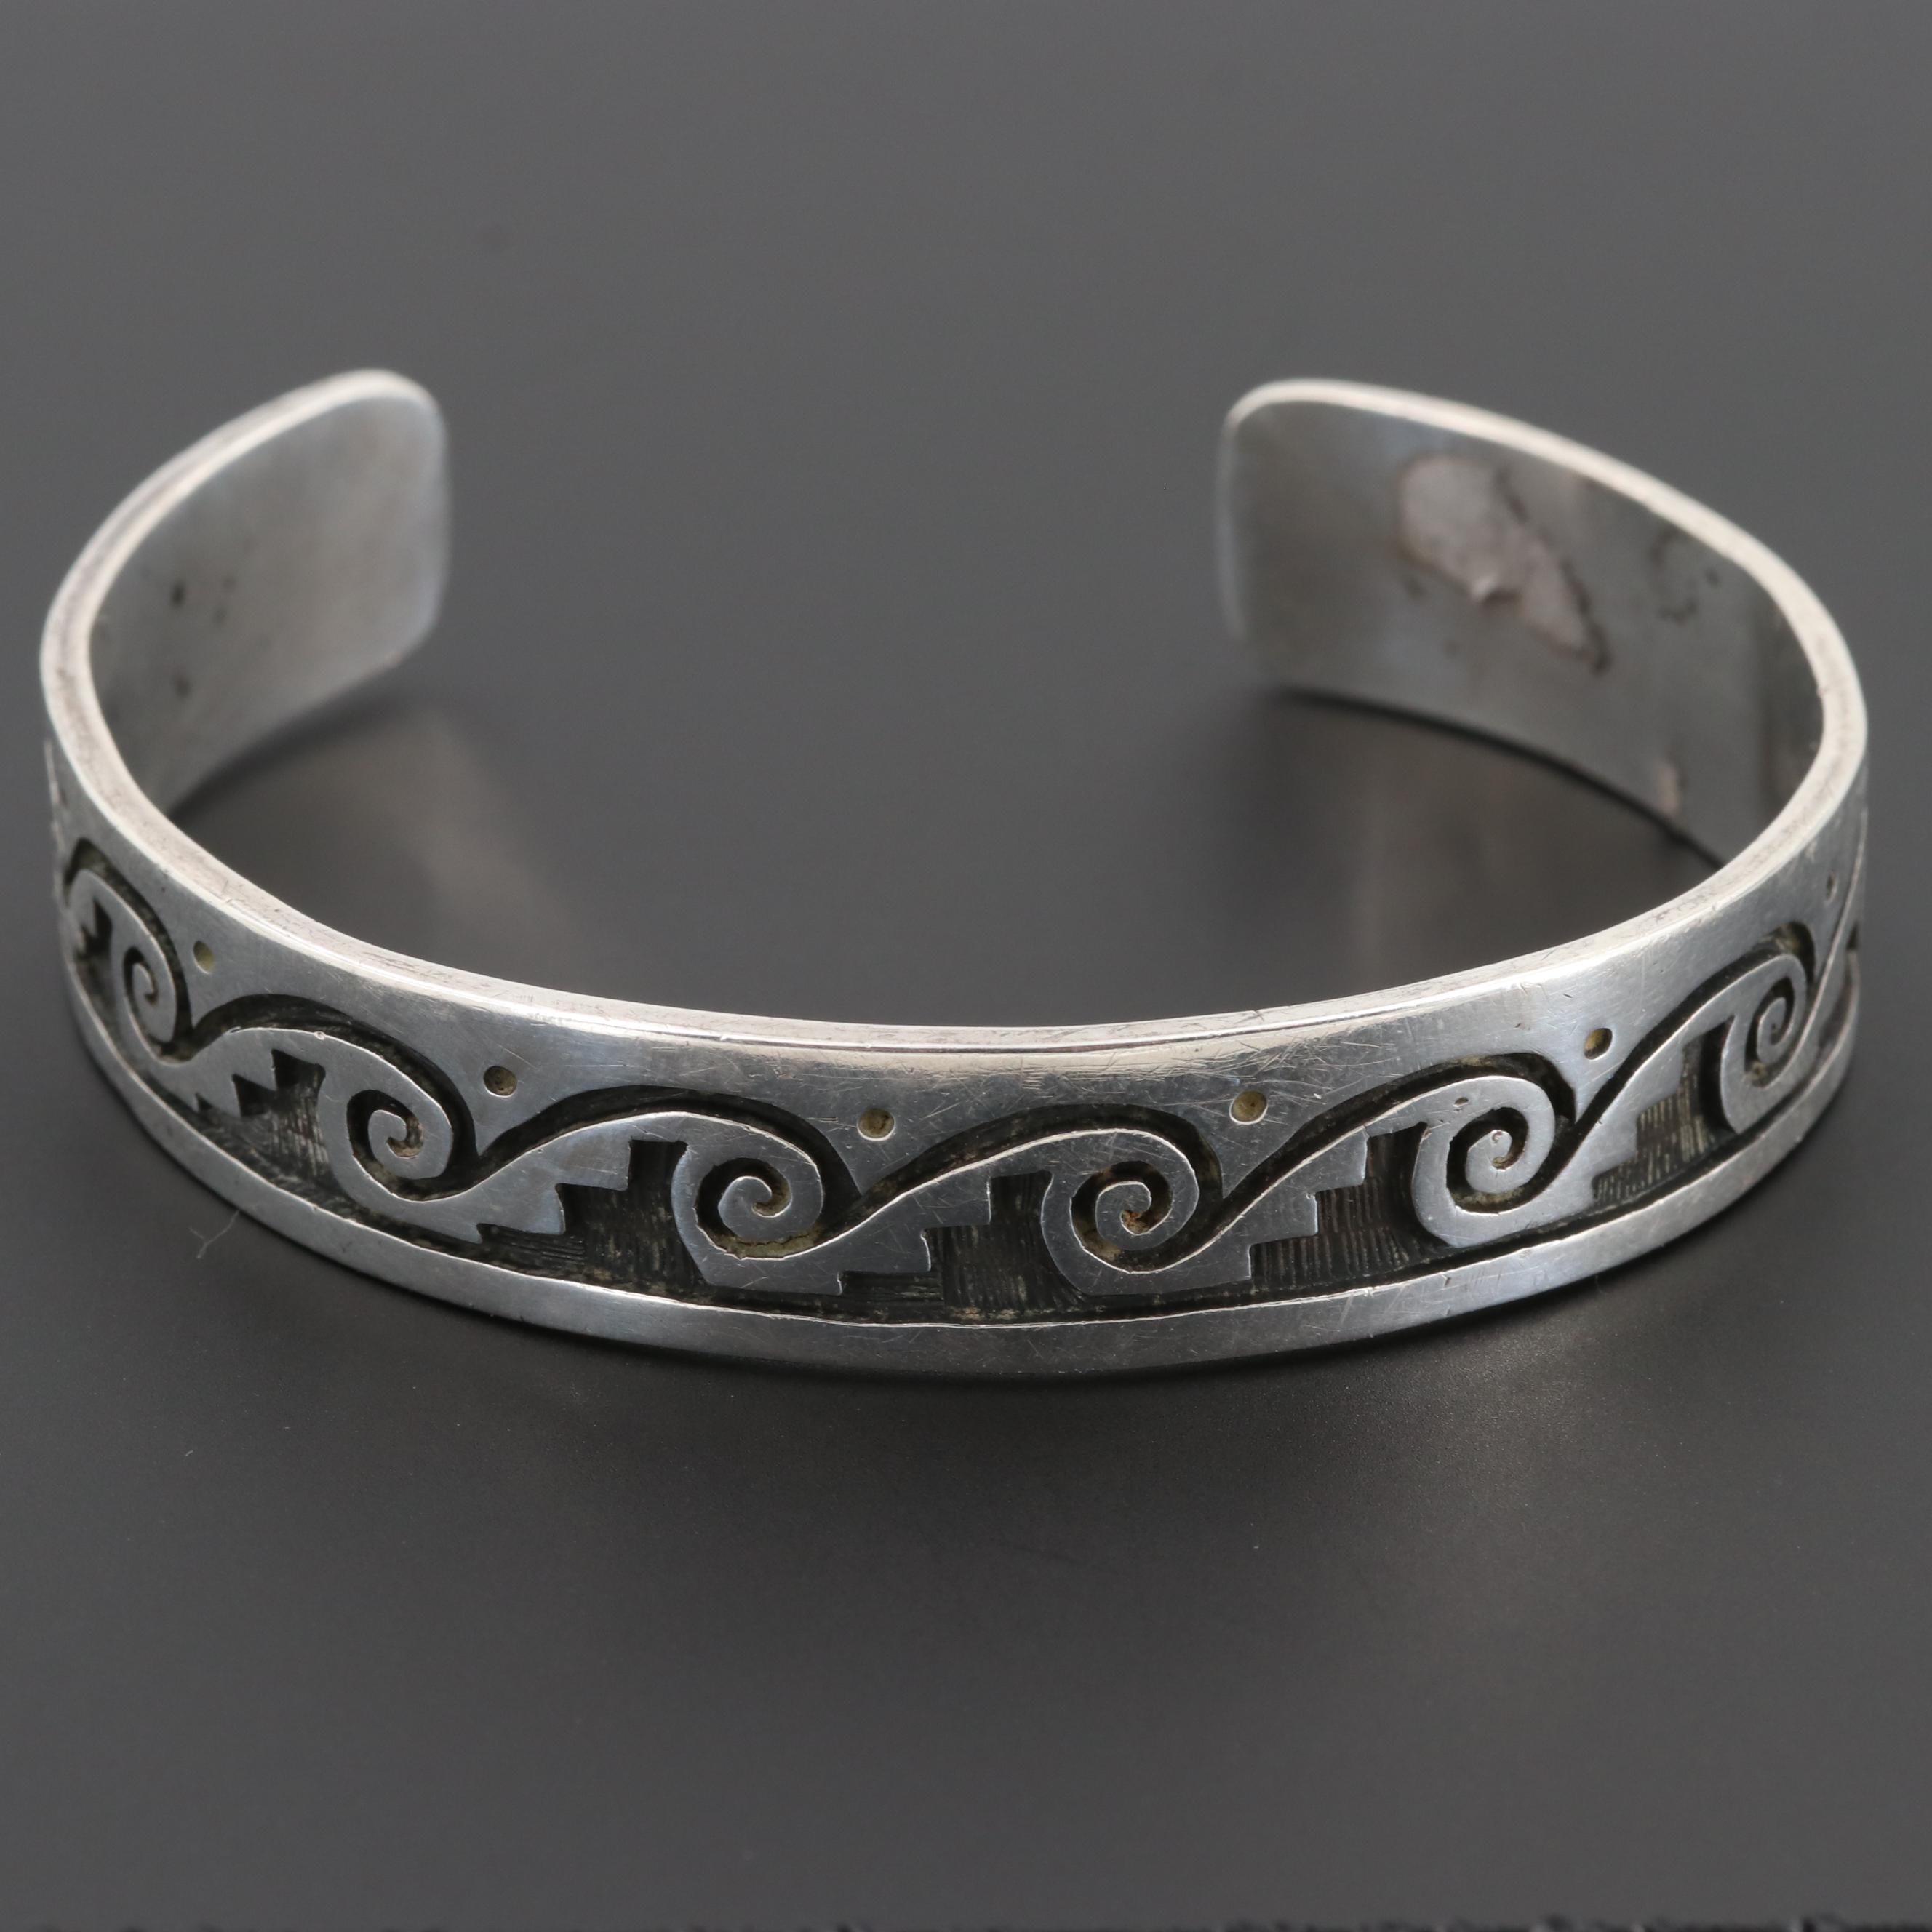 Cyrus Josytewa Hopi Sterling Silver Overlay Cuff Bracelet